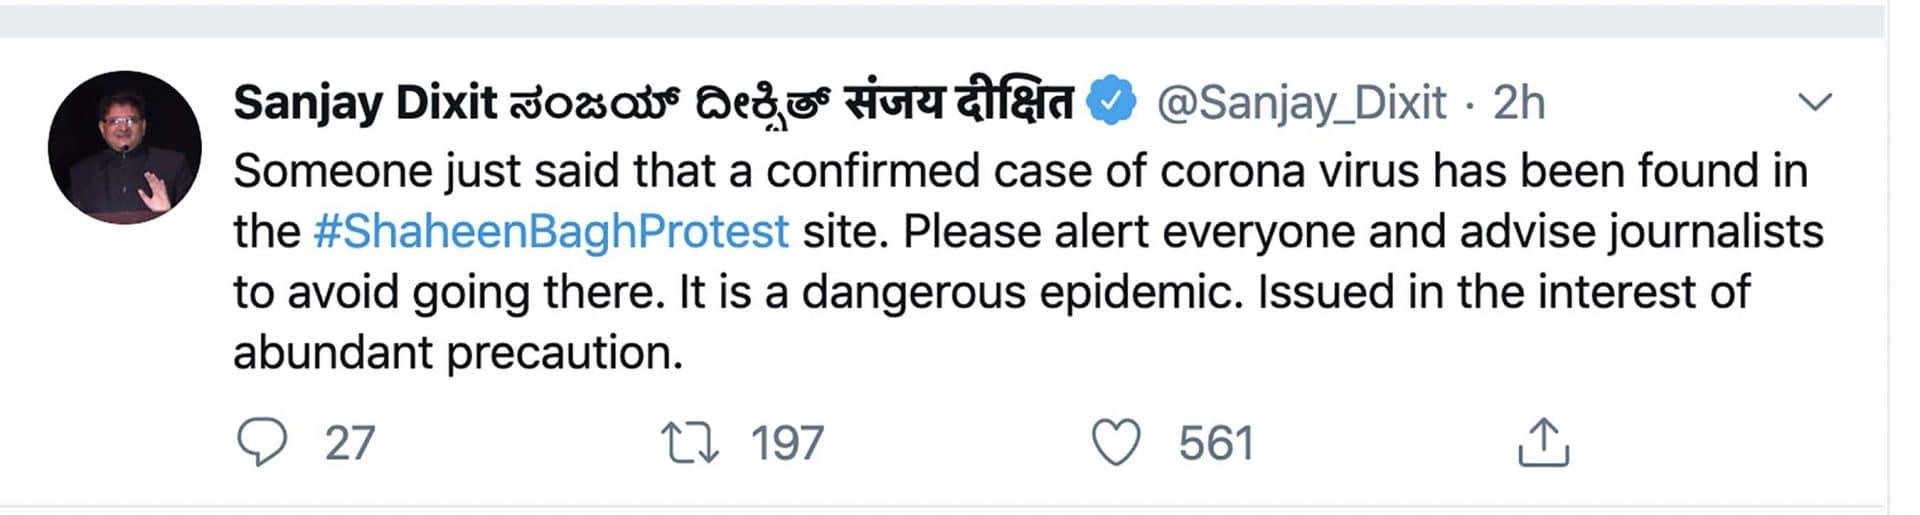 A tweet spreading coronavirus-related disinformation.